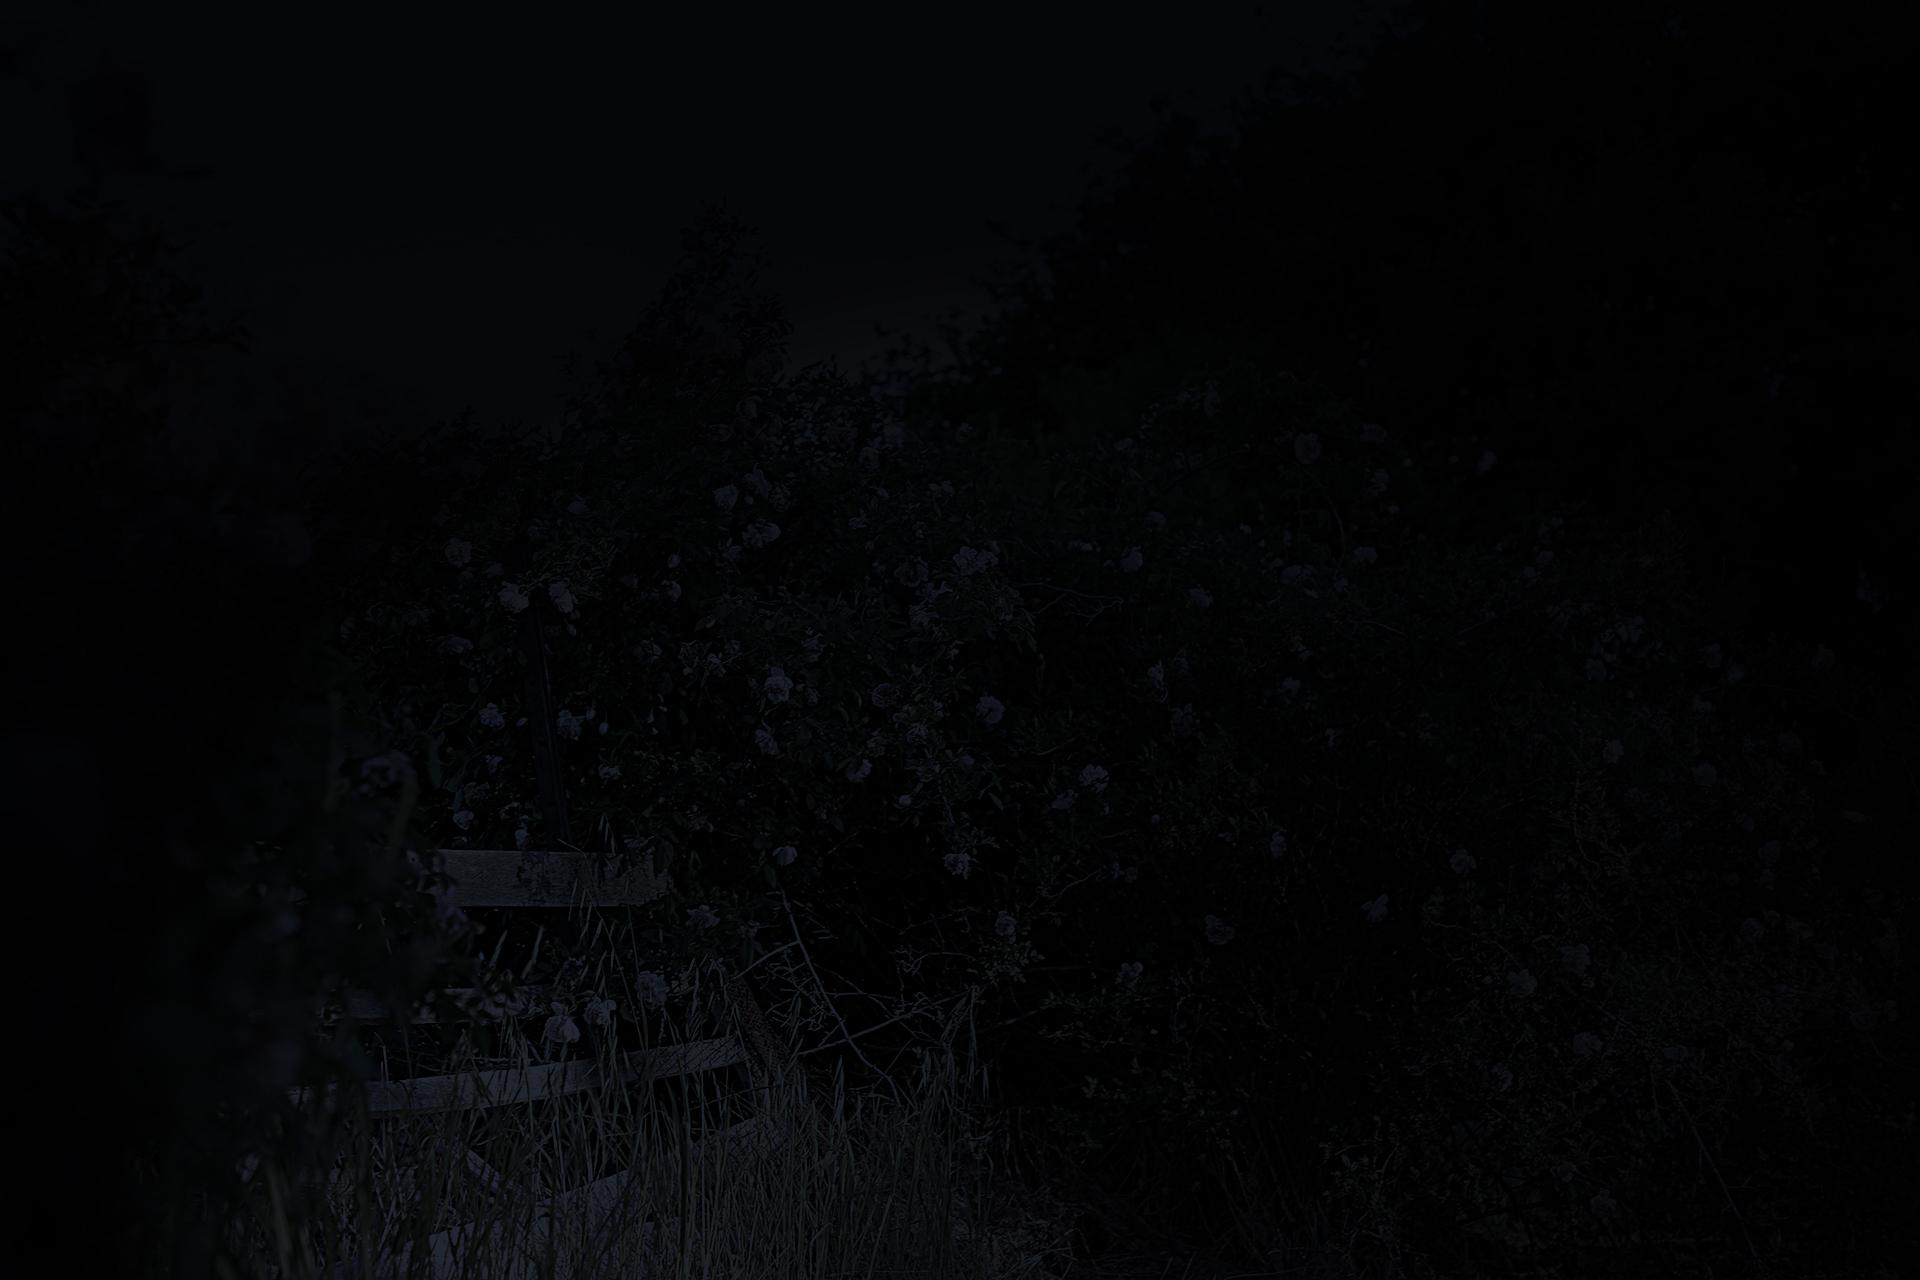 Rose_Gate_Evening_edit_02